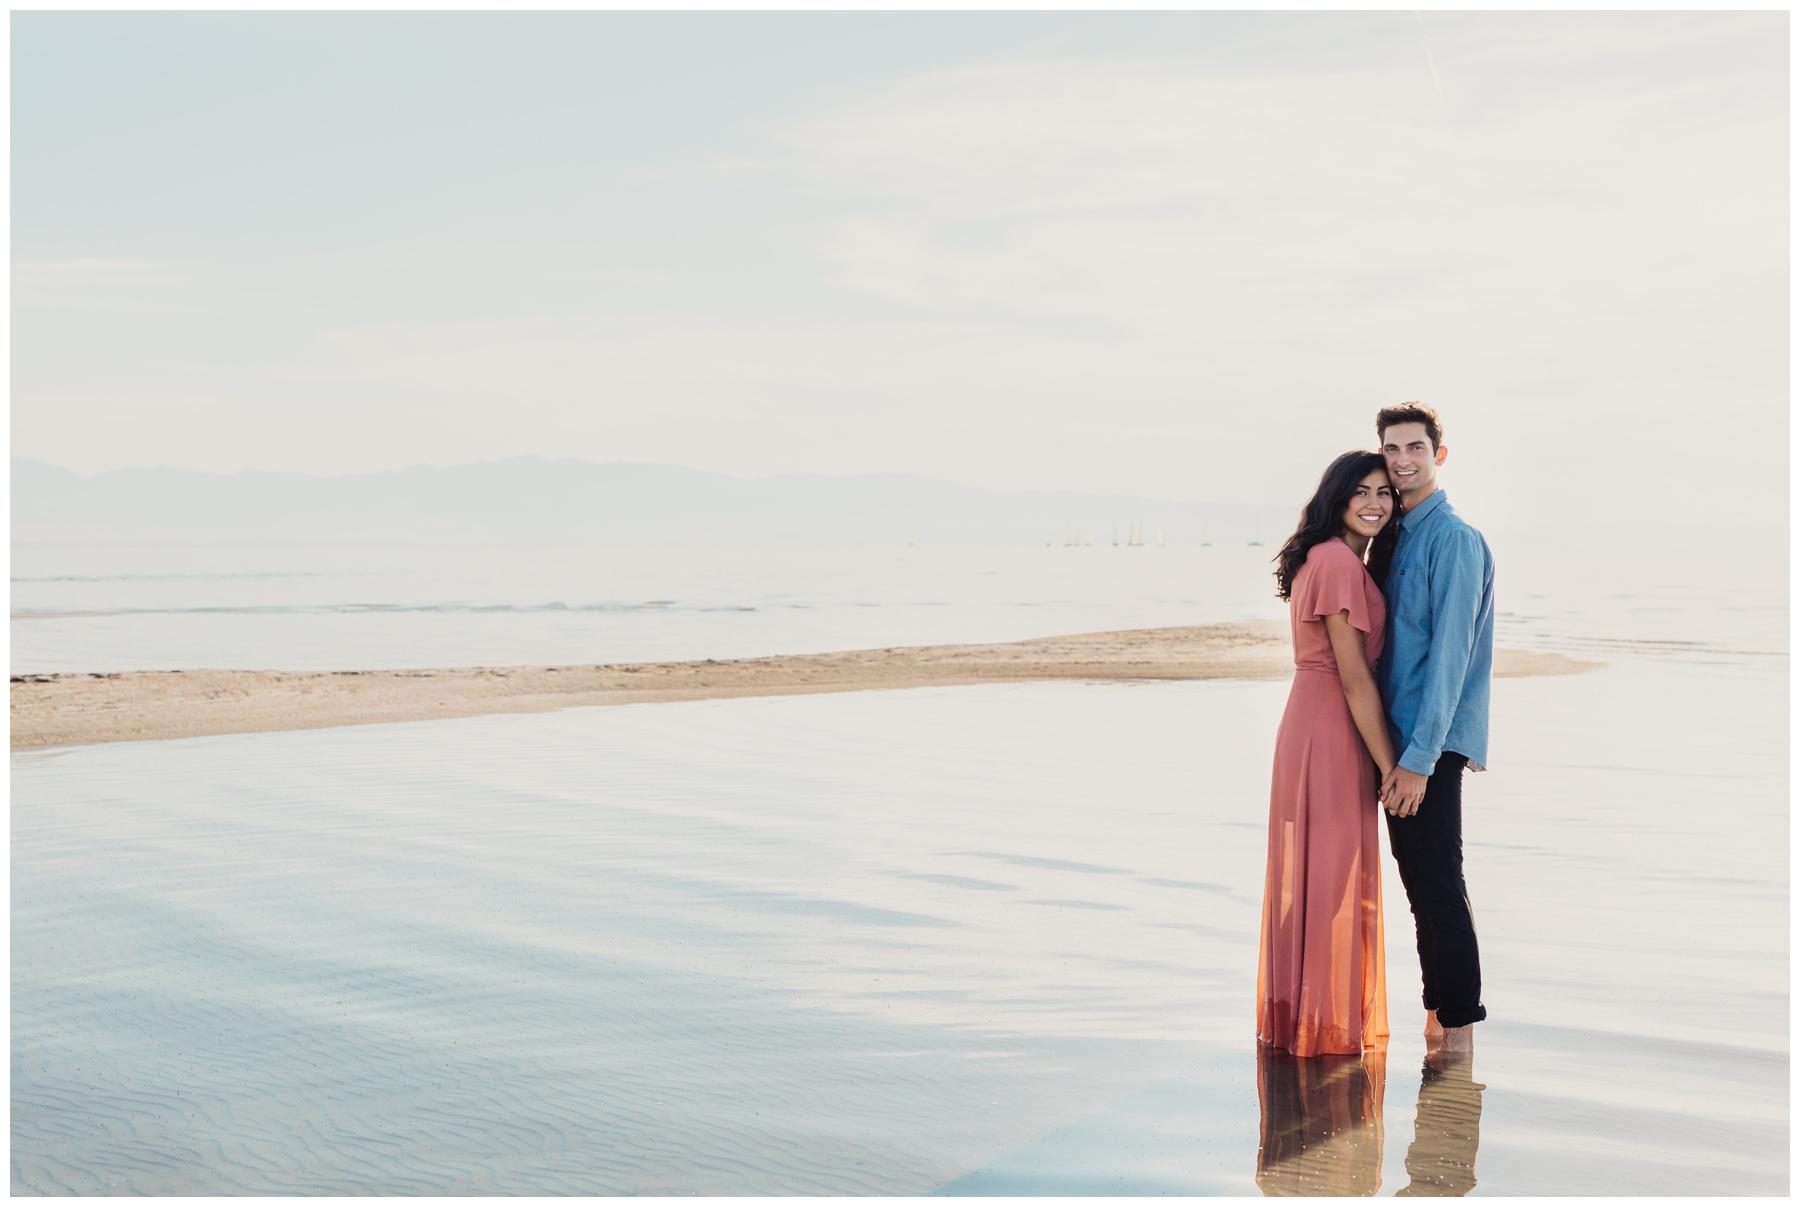 best wedding photographer in slc utah